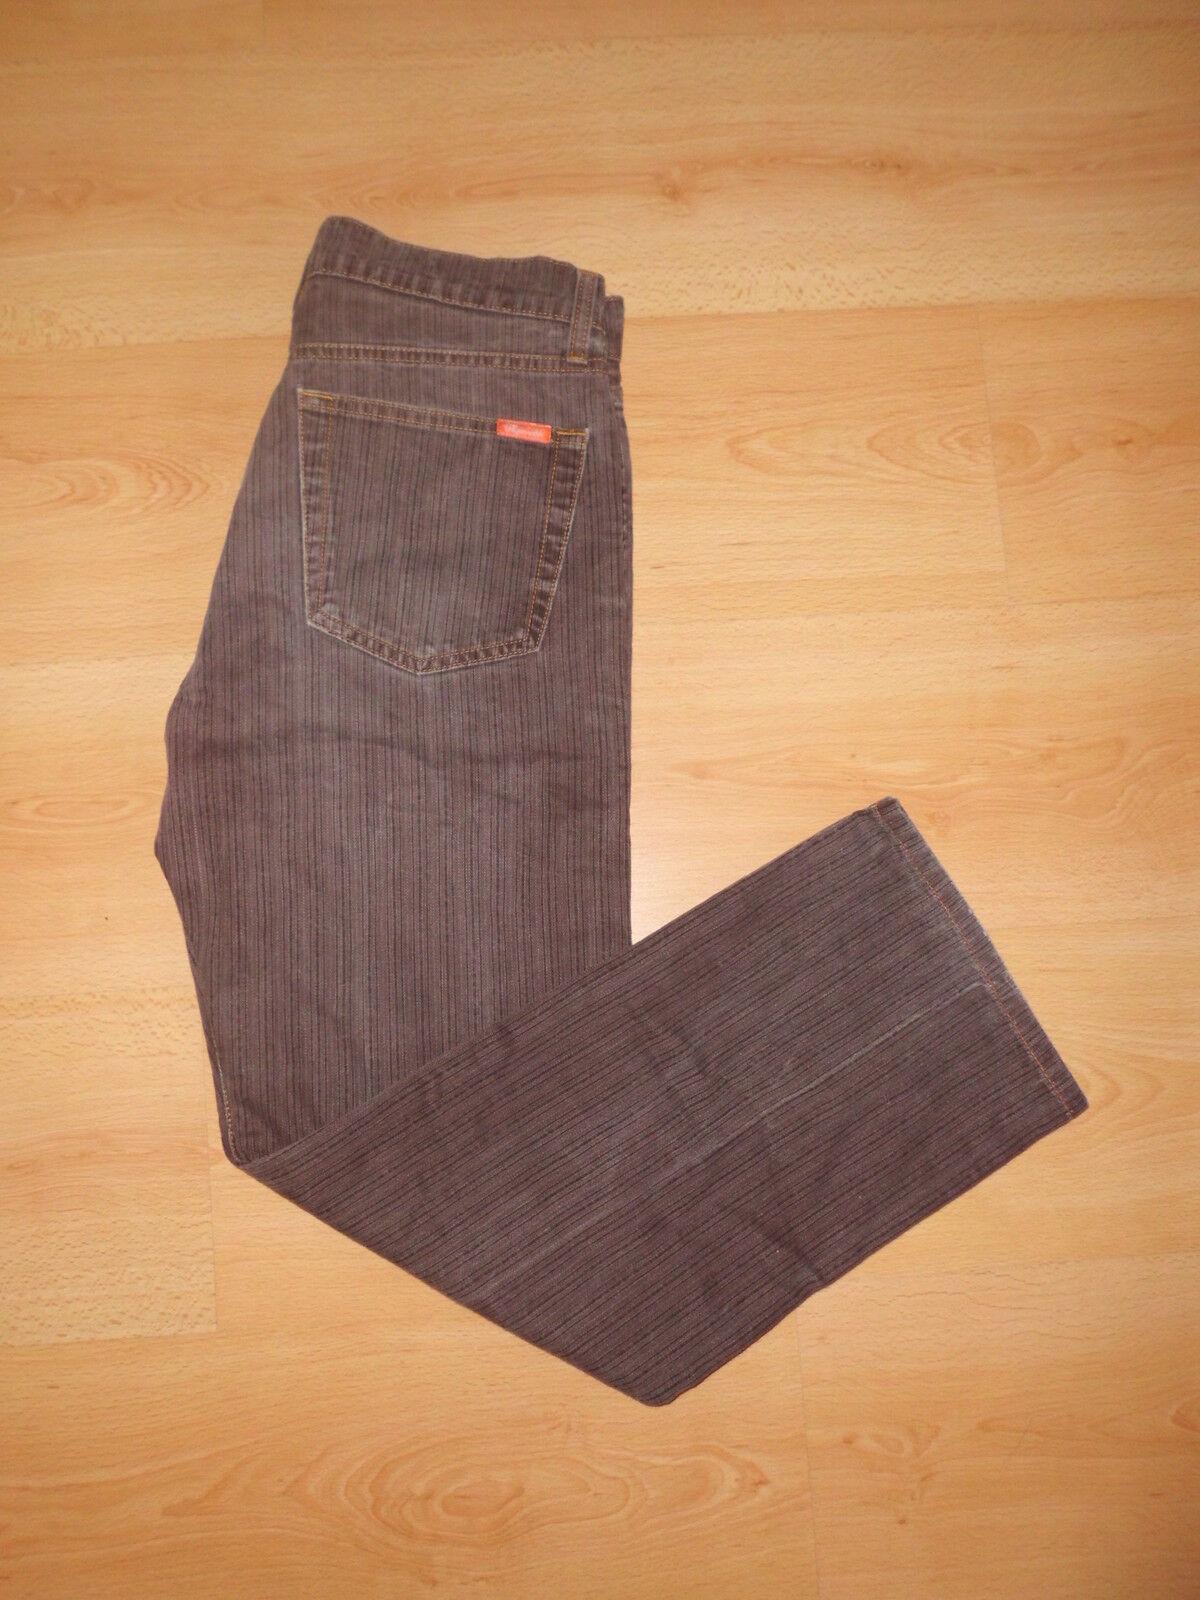 Jeans Façonnable F40Z braun Größe 39 à - 73%    Große Auswahl